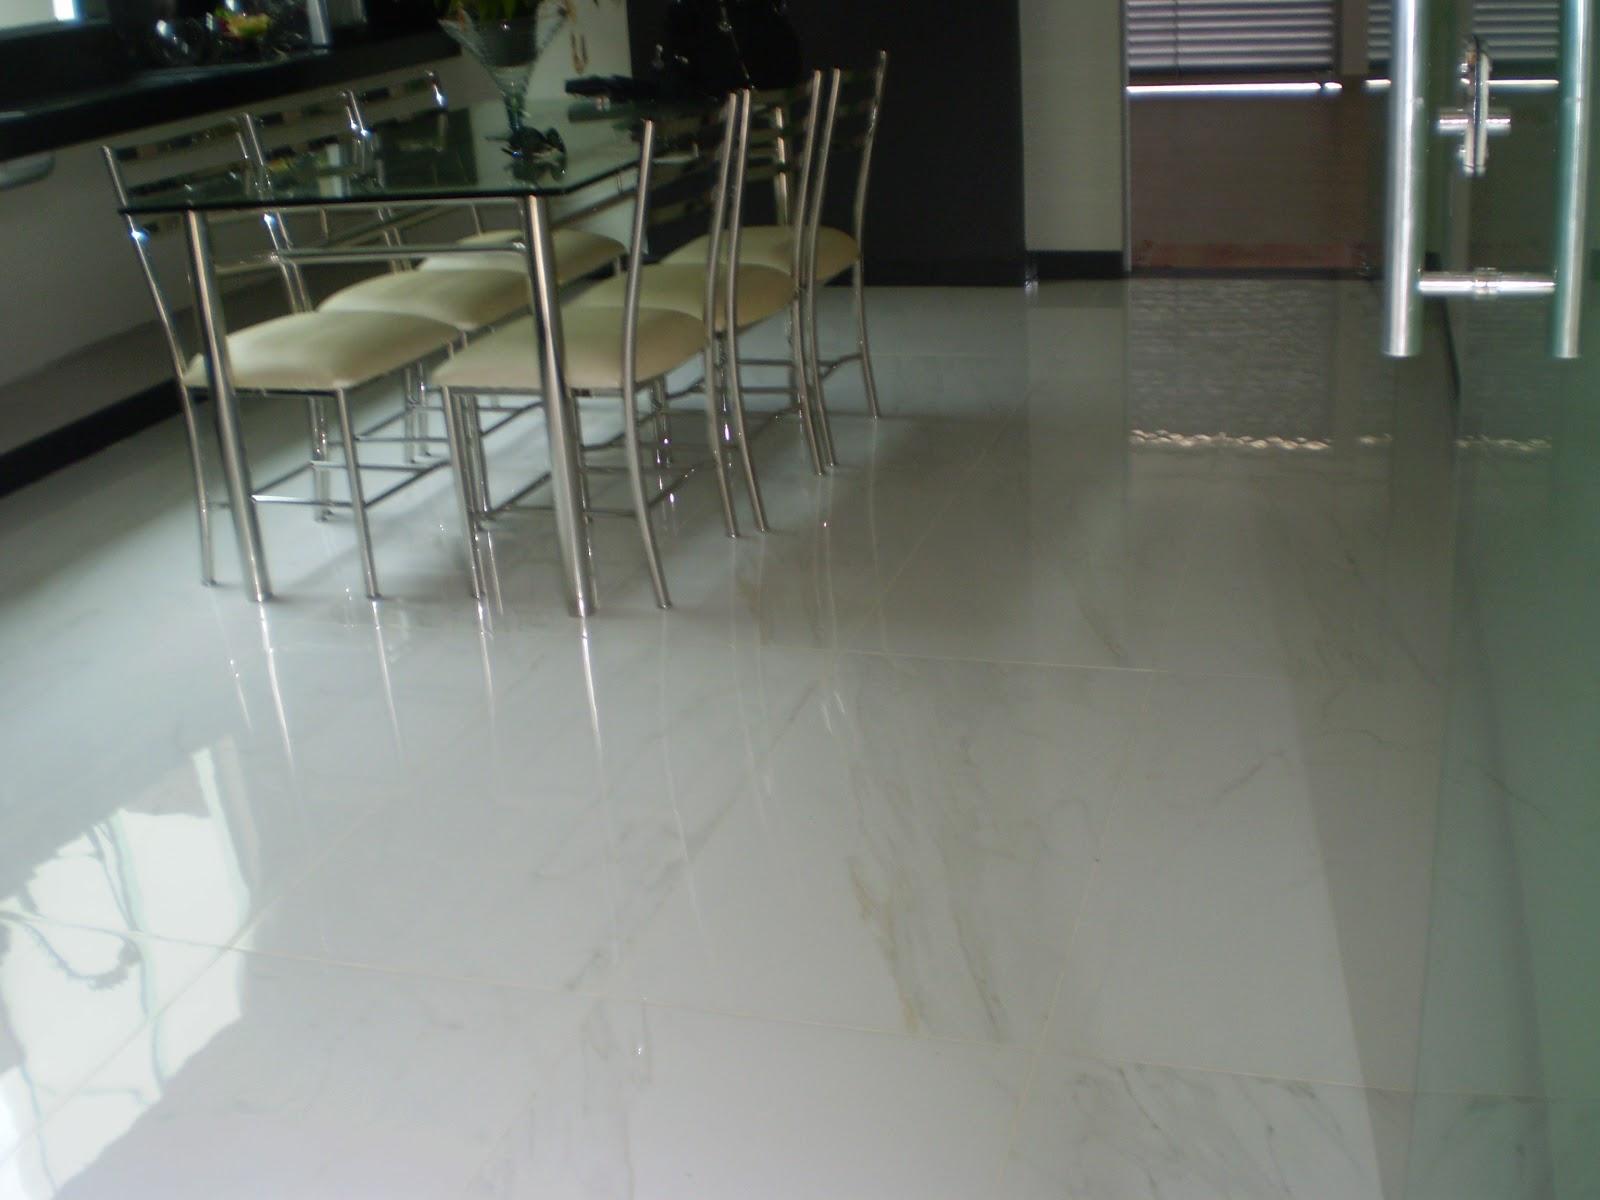 Piso Porcelanato Para Cozinha Rstico Cinza Cimento Piso Porcelanato  -> Sala Com O Piso Porcelanato Polido Cinza